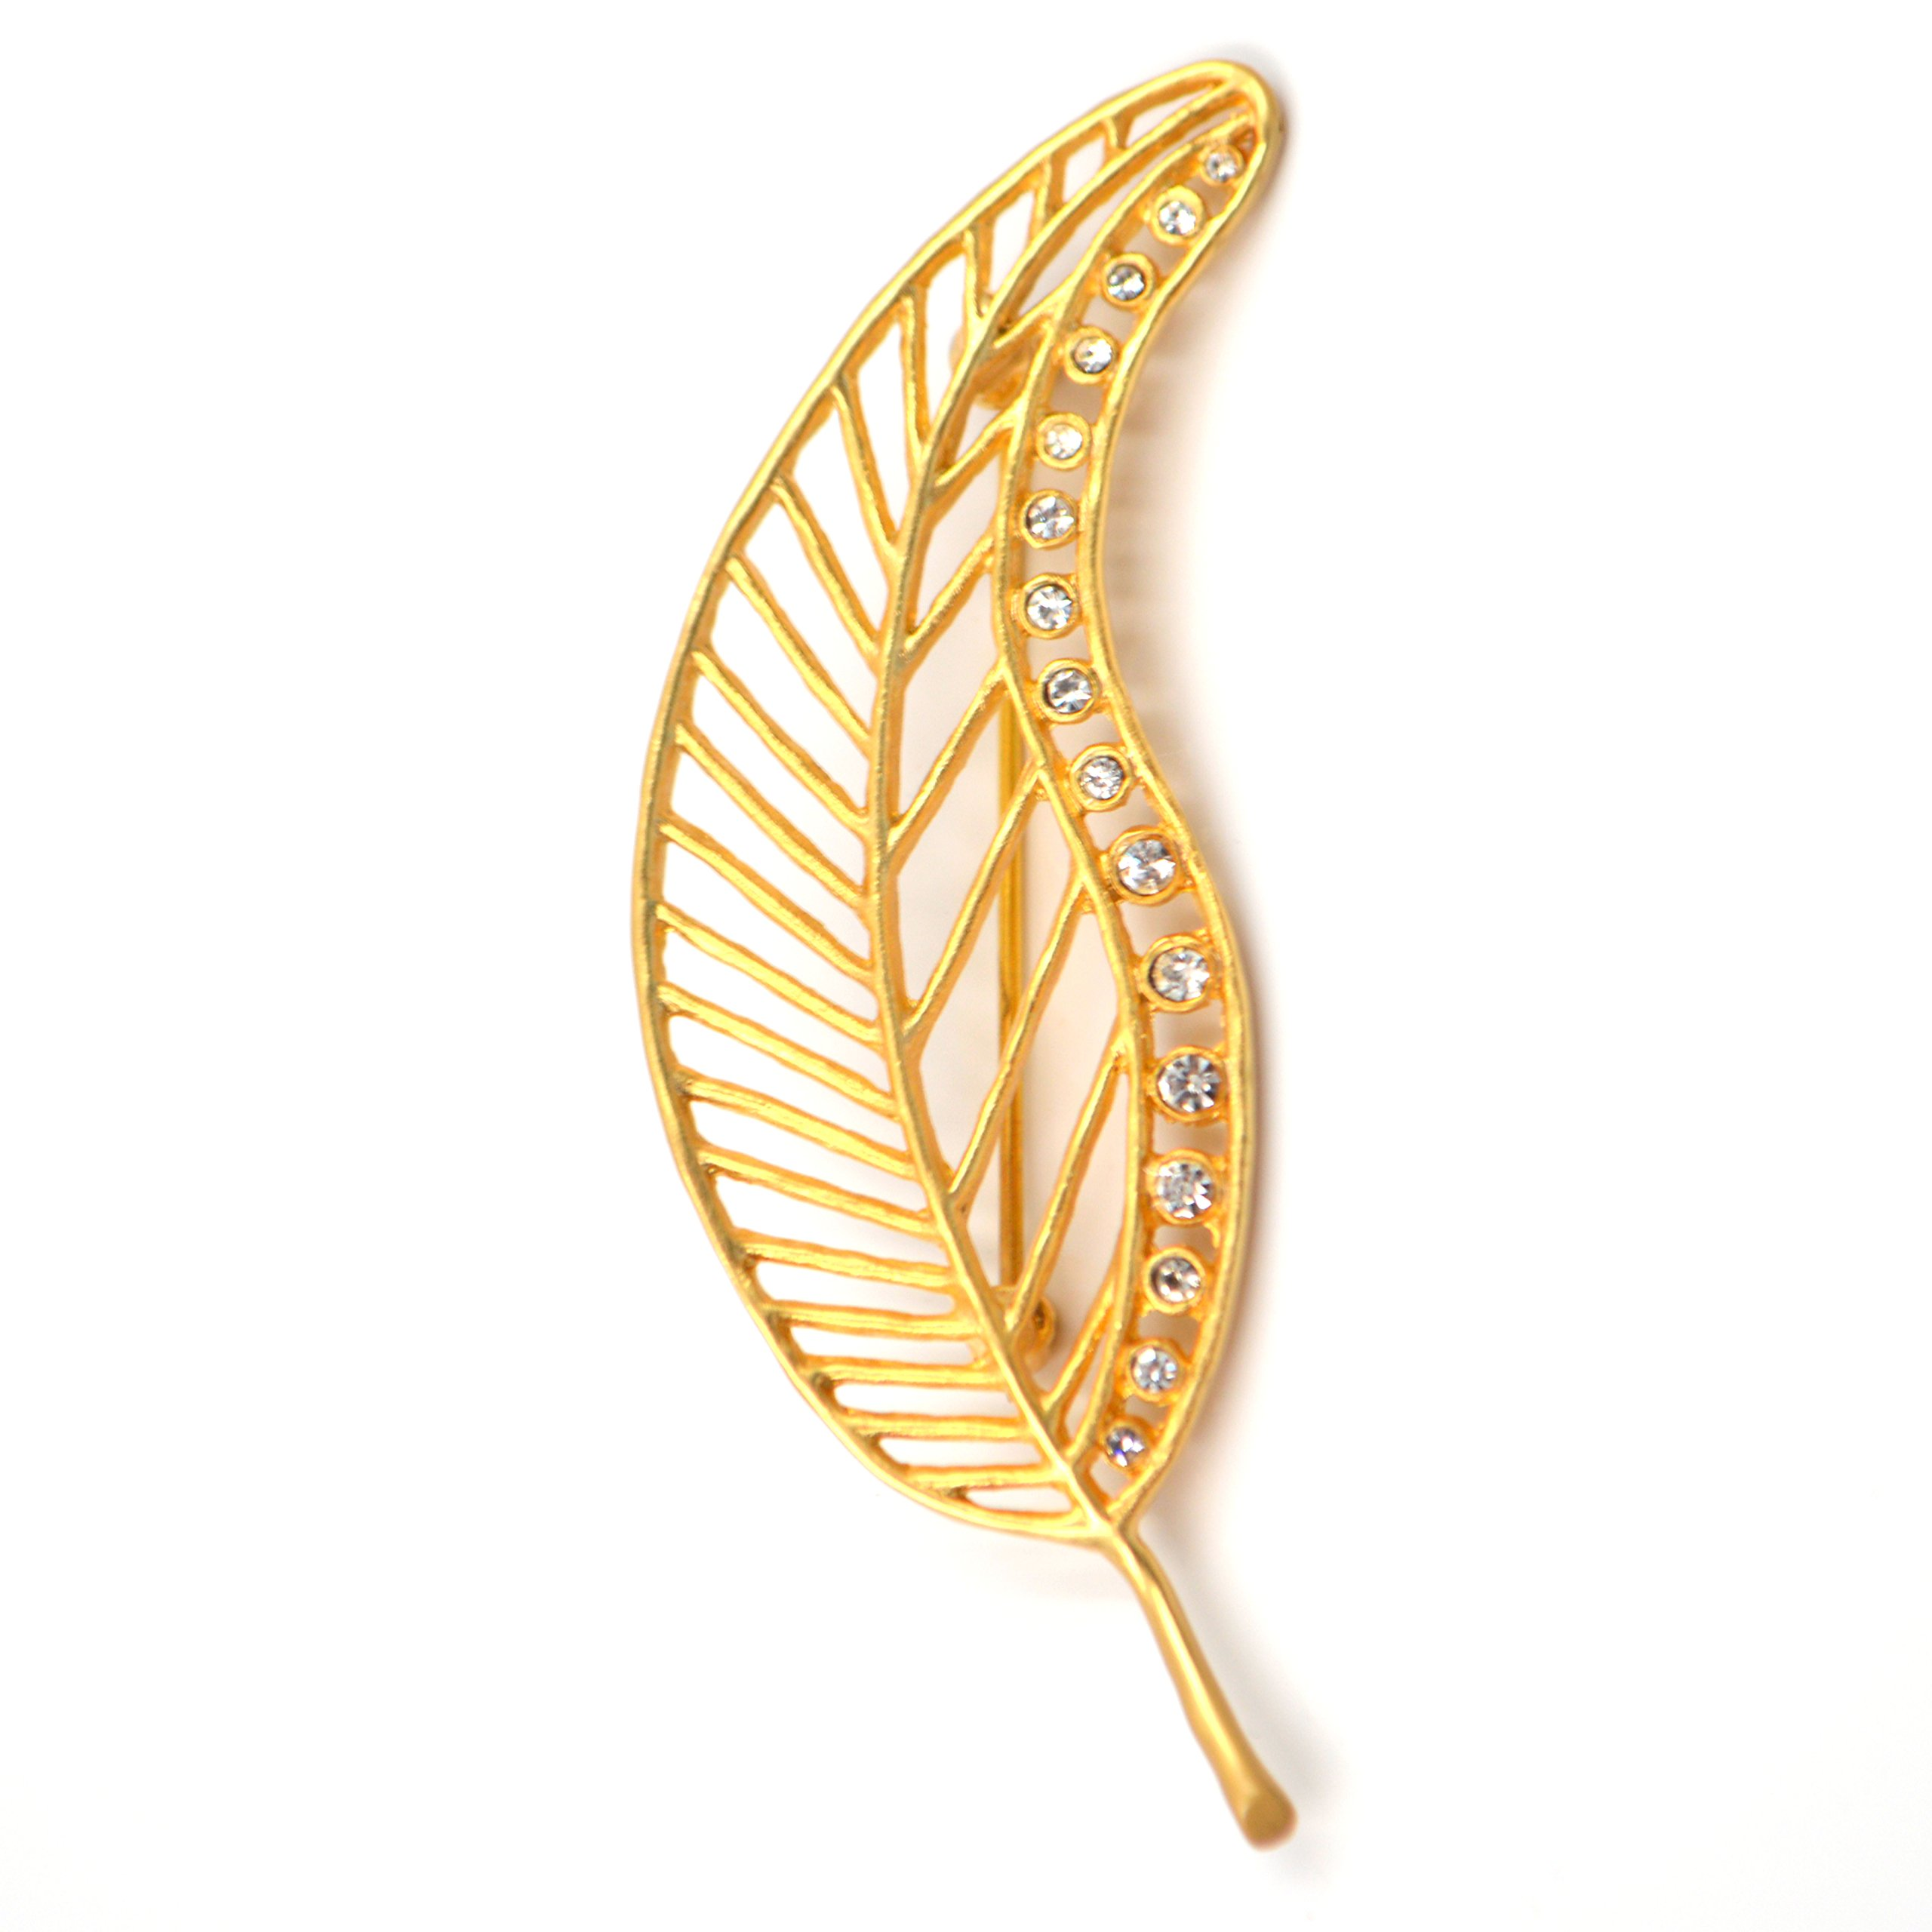 Chevron Leaf Pin (24k Gold-Plated with Swarovski Crystals) by Mercedes Shaffer